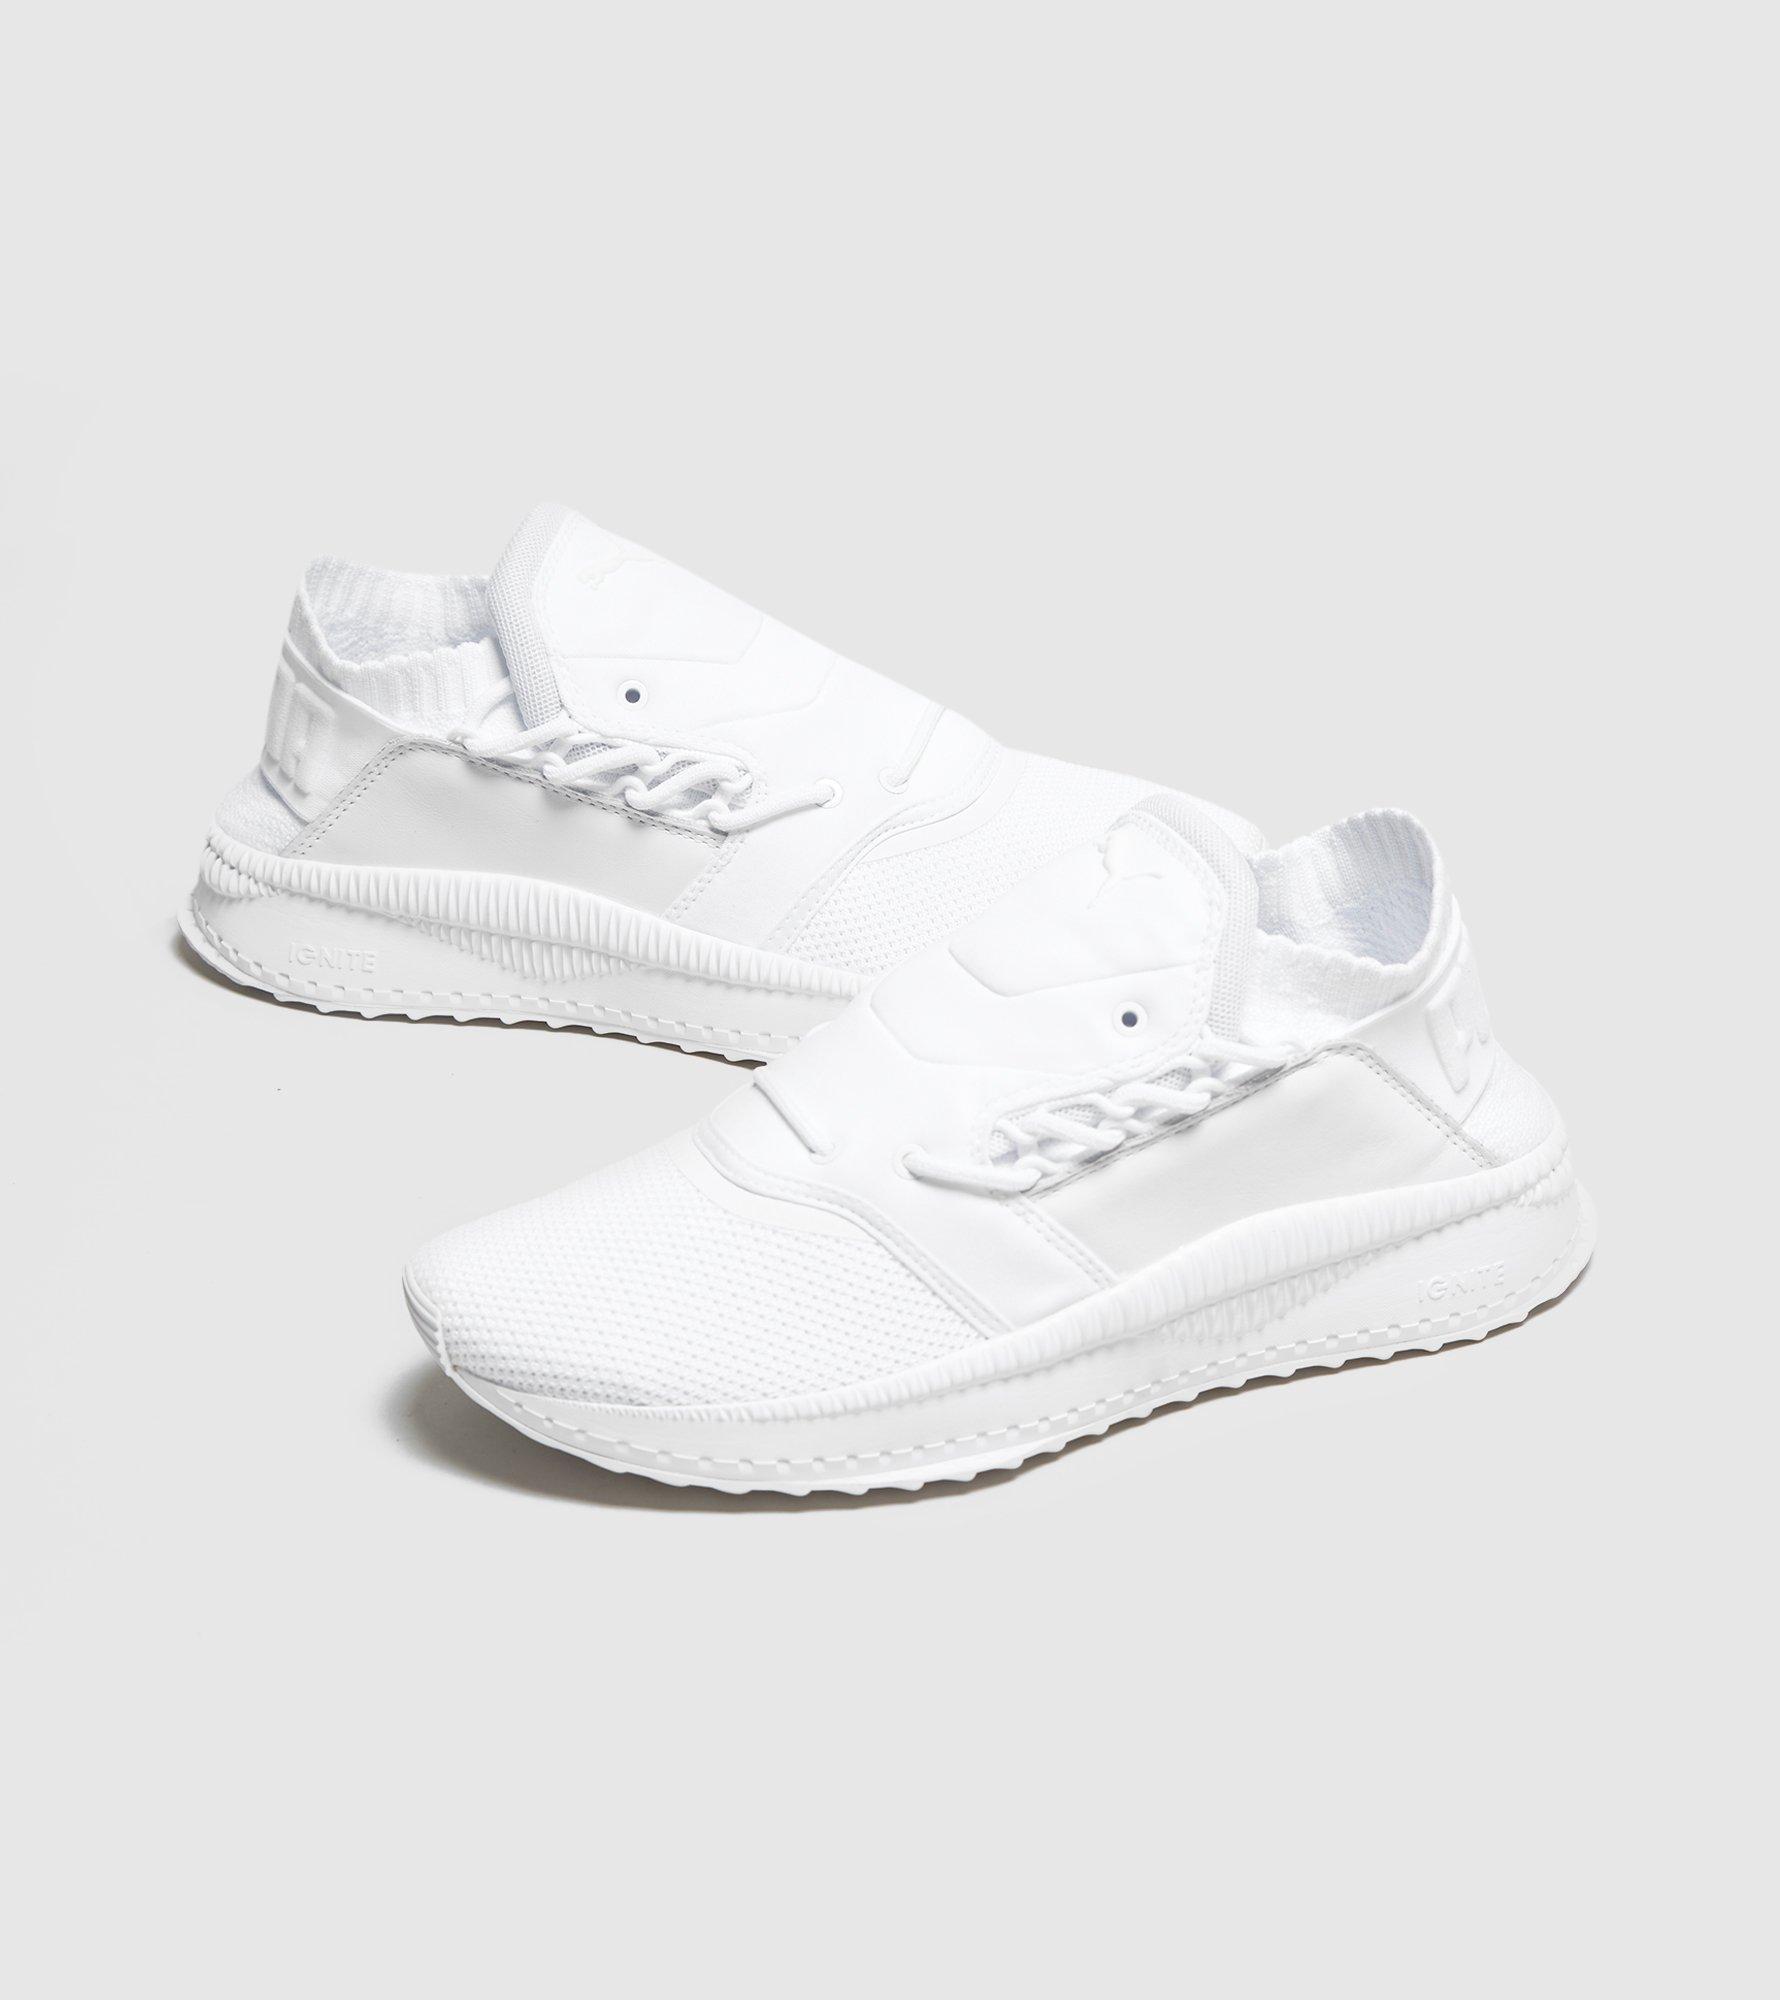 48114cd8044a Puma Tsugi Shinsei in White for Men - Lyst